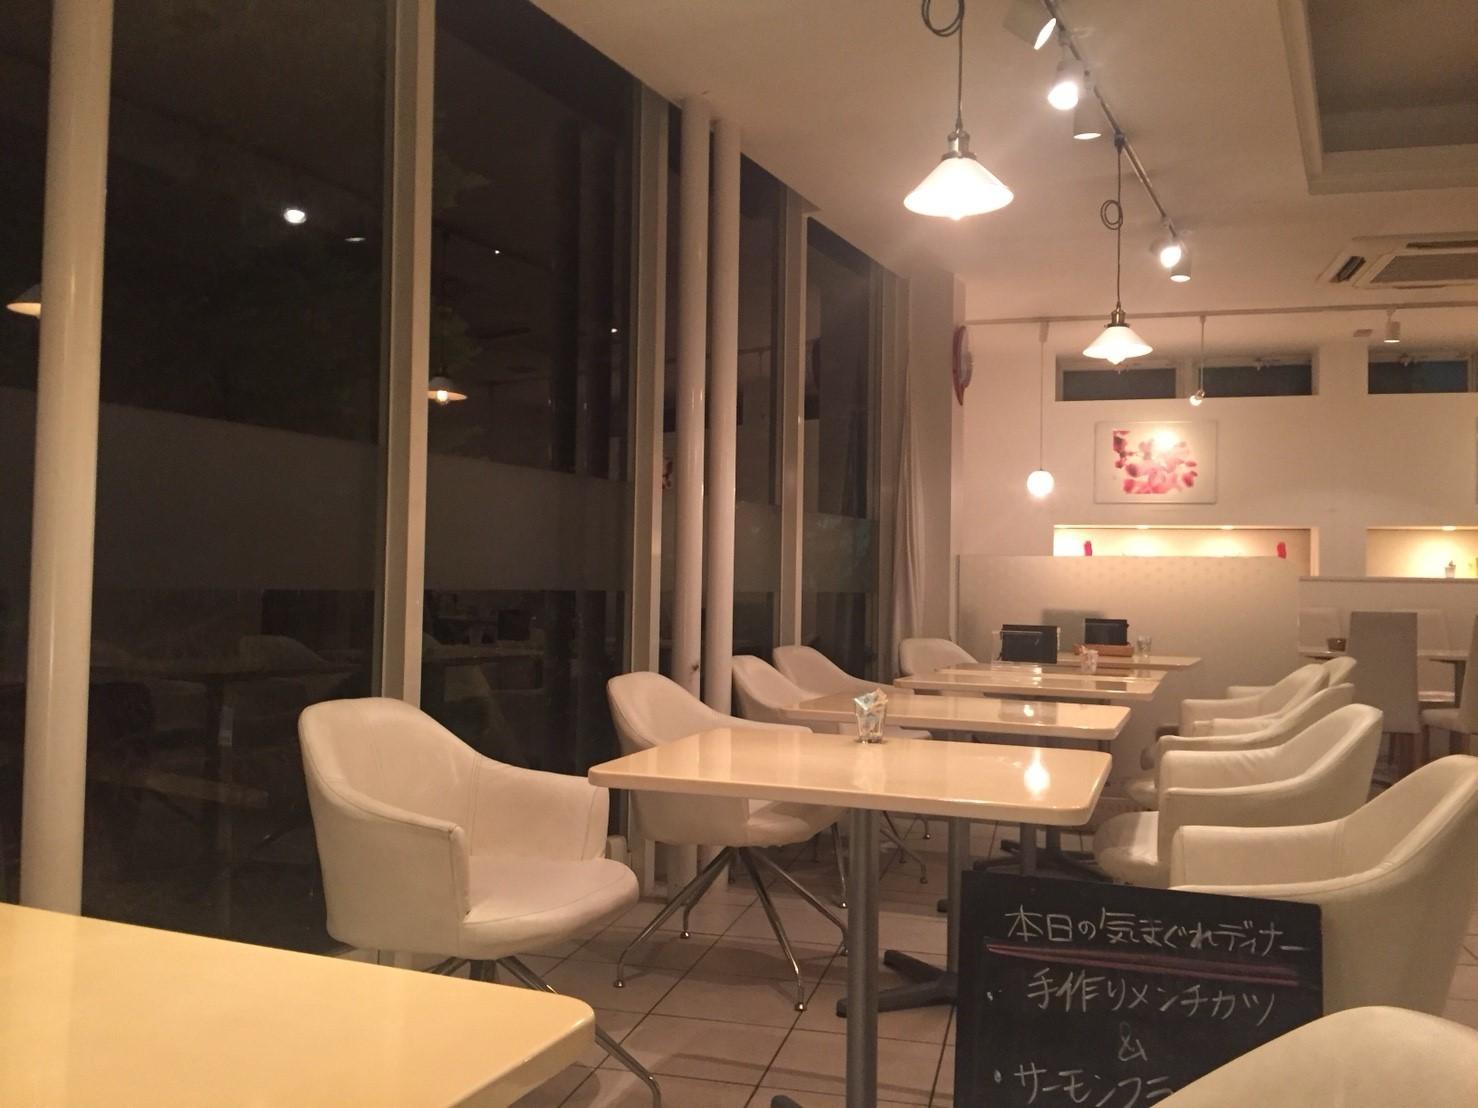 cafe coeur  ディナー_e0115904_22412381.jpg